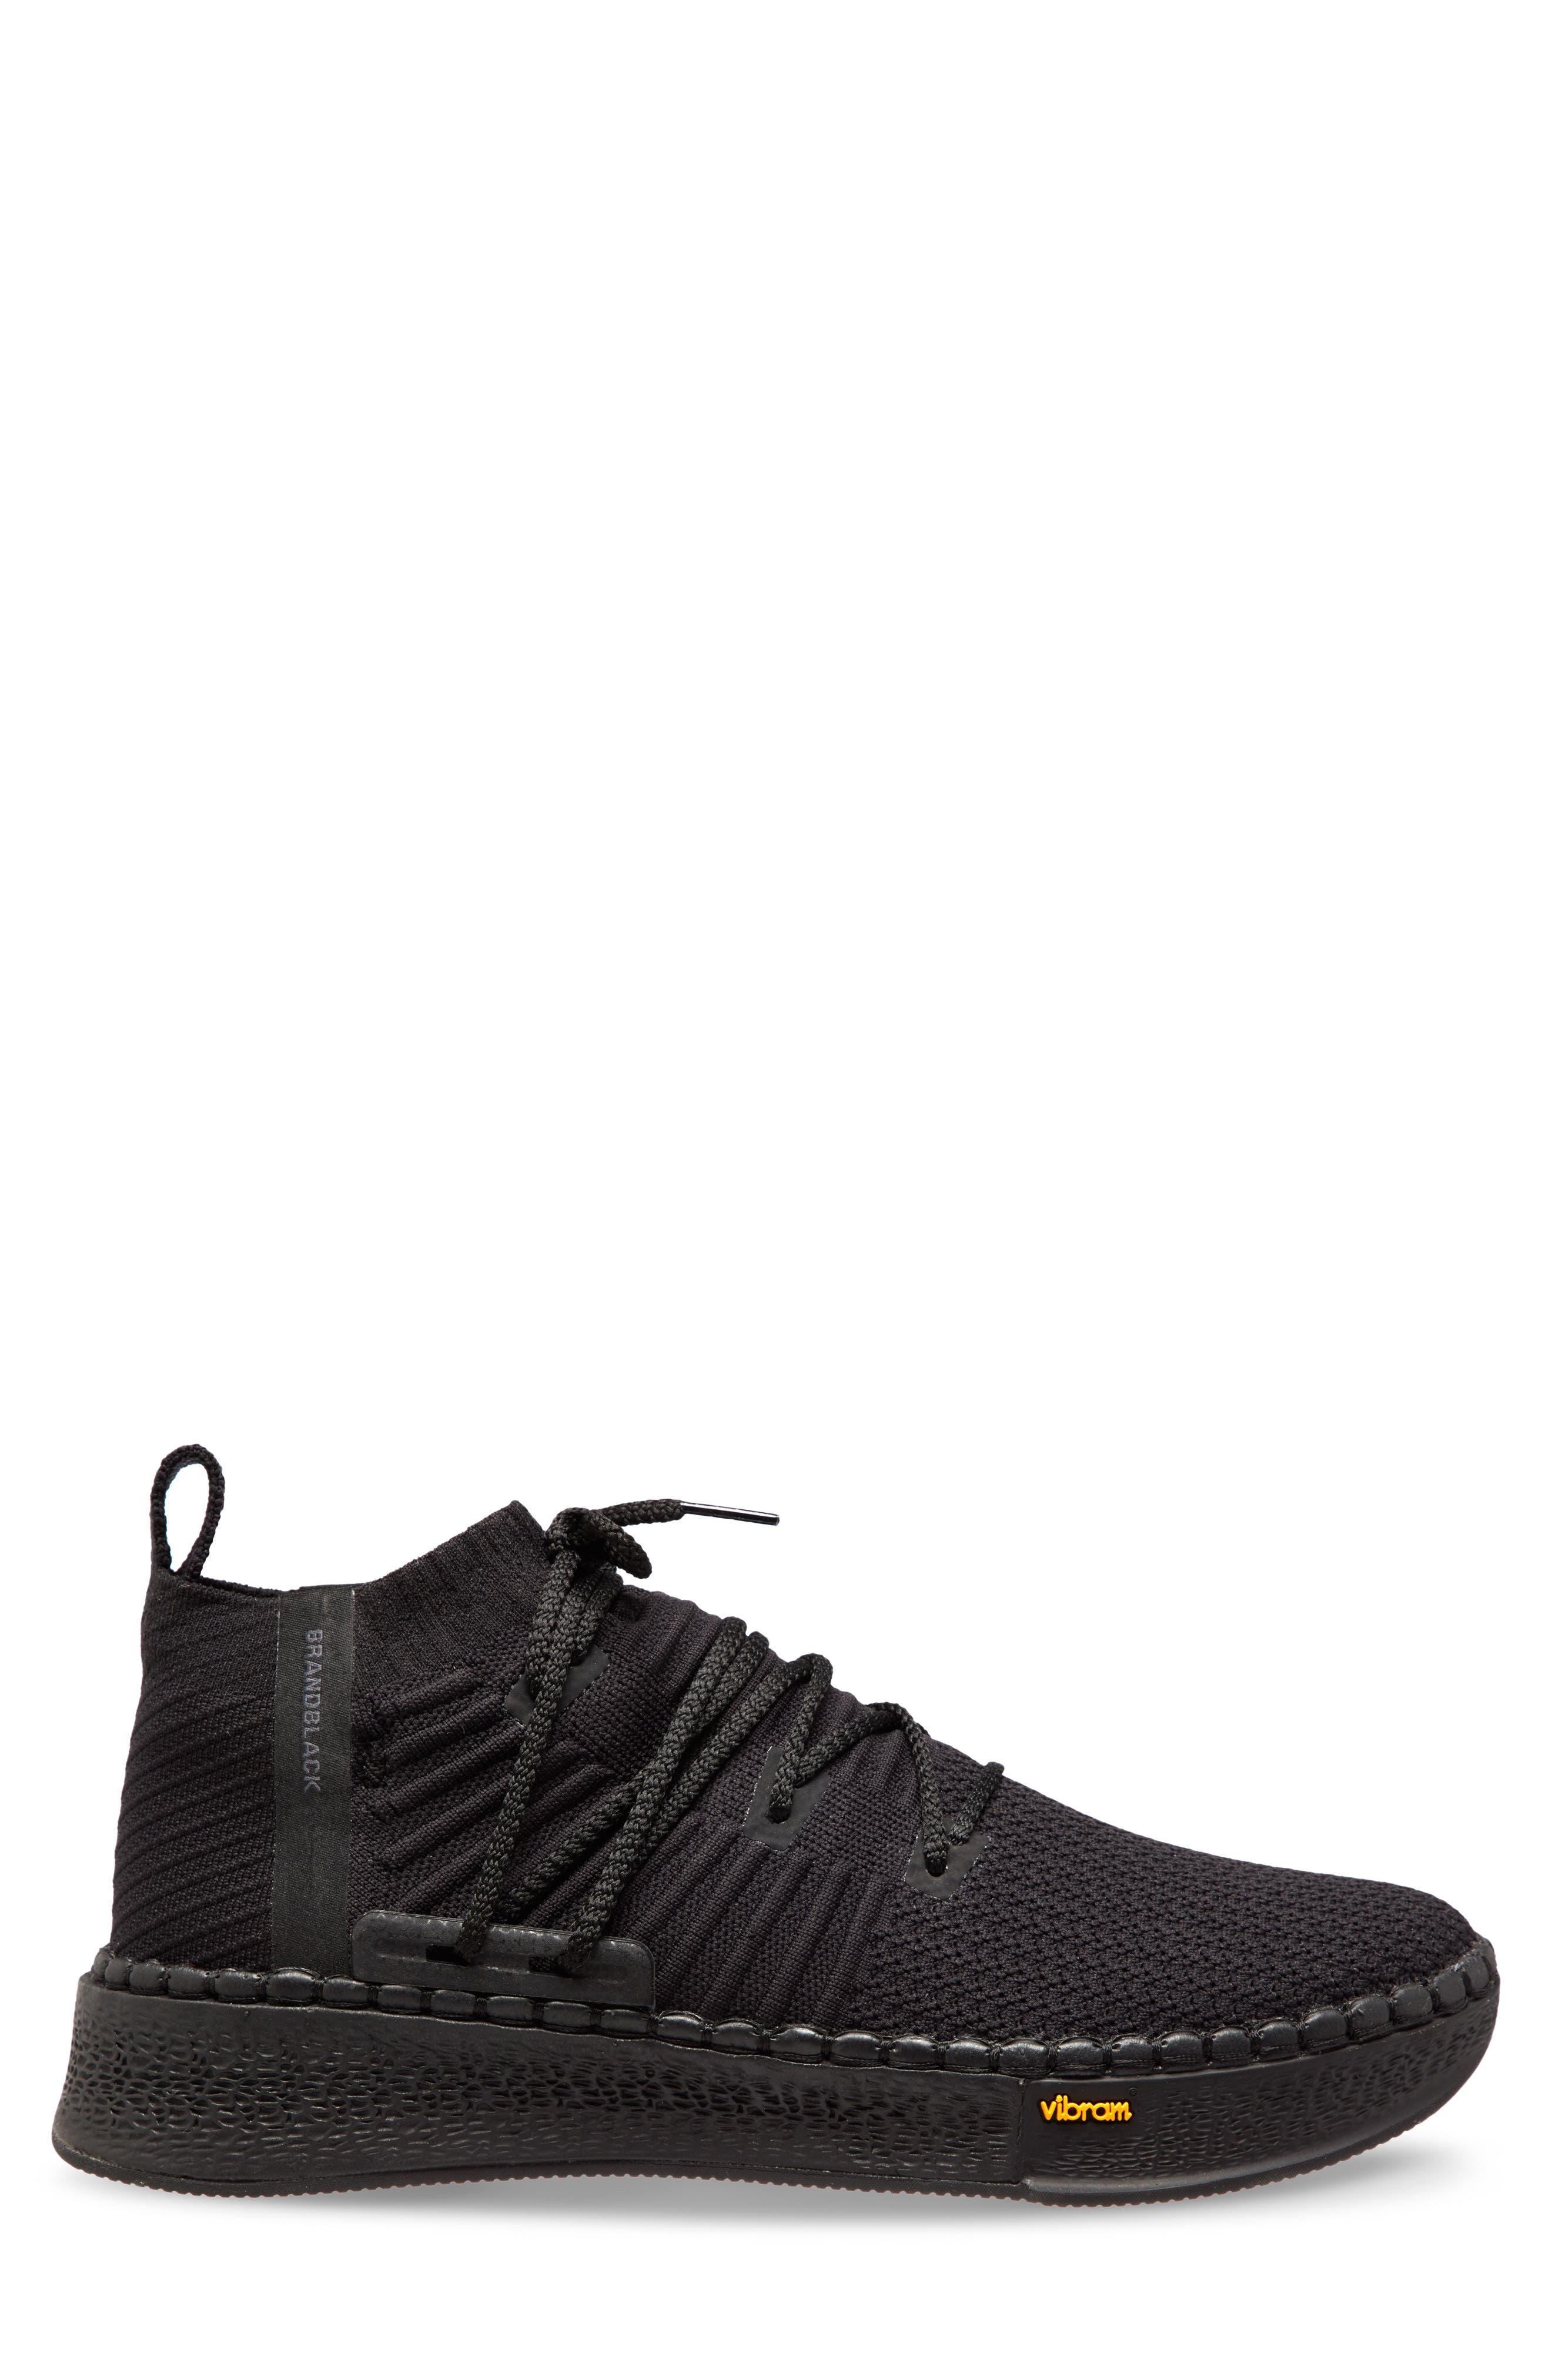 Delta Sneaker,                             Alternate thumbnail 3, color,                             Black